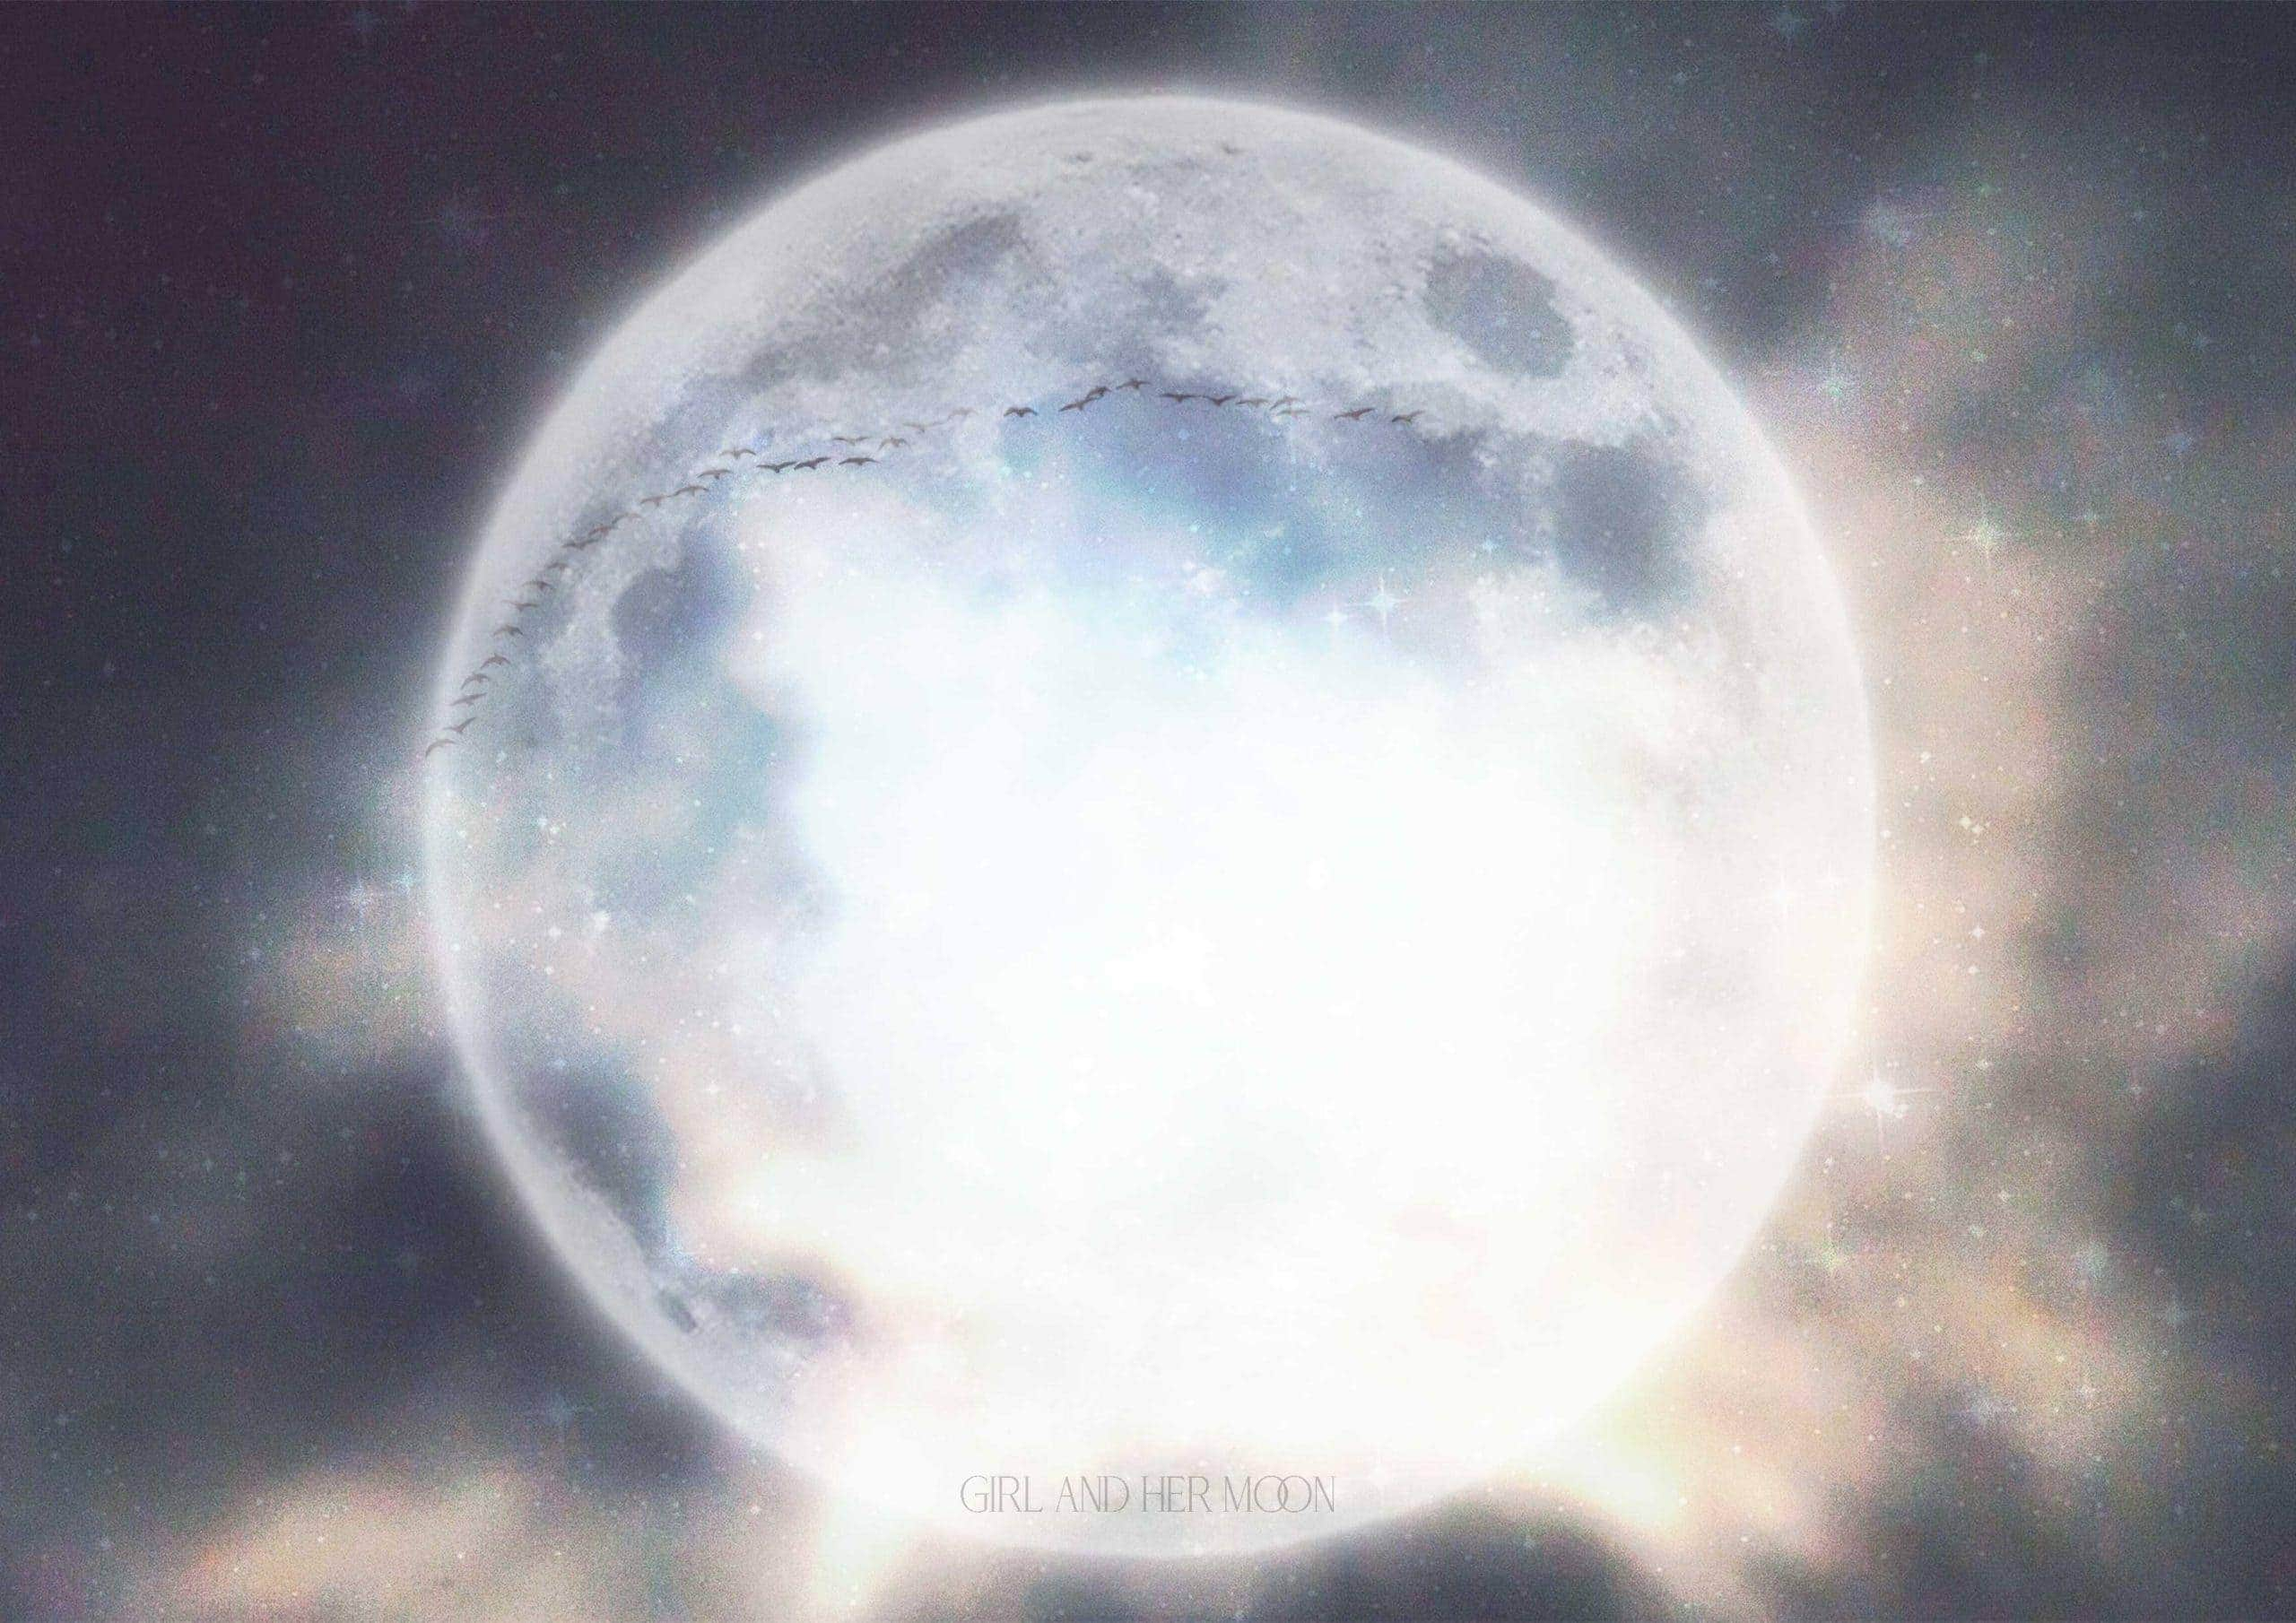 Taurus Full Moon October 2020 Girl and Her Moon